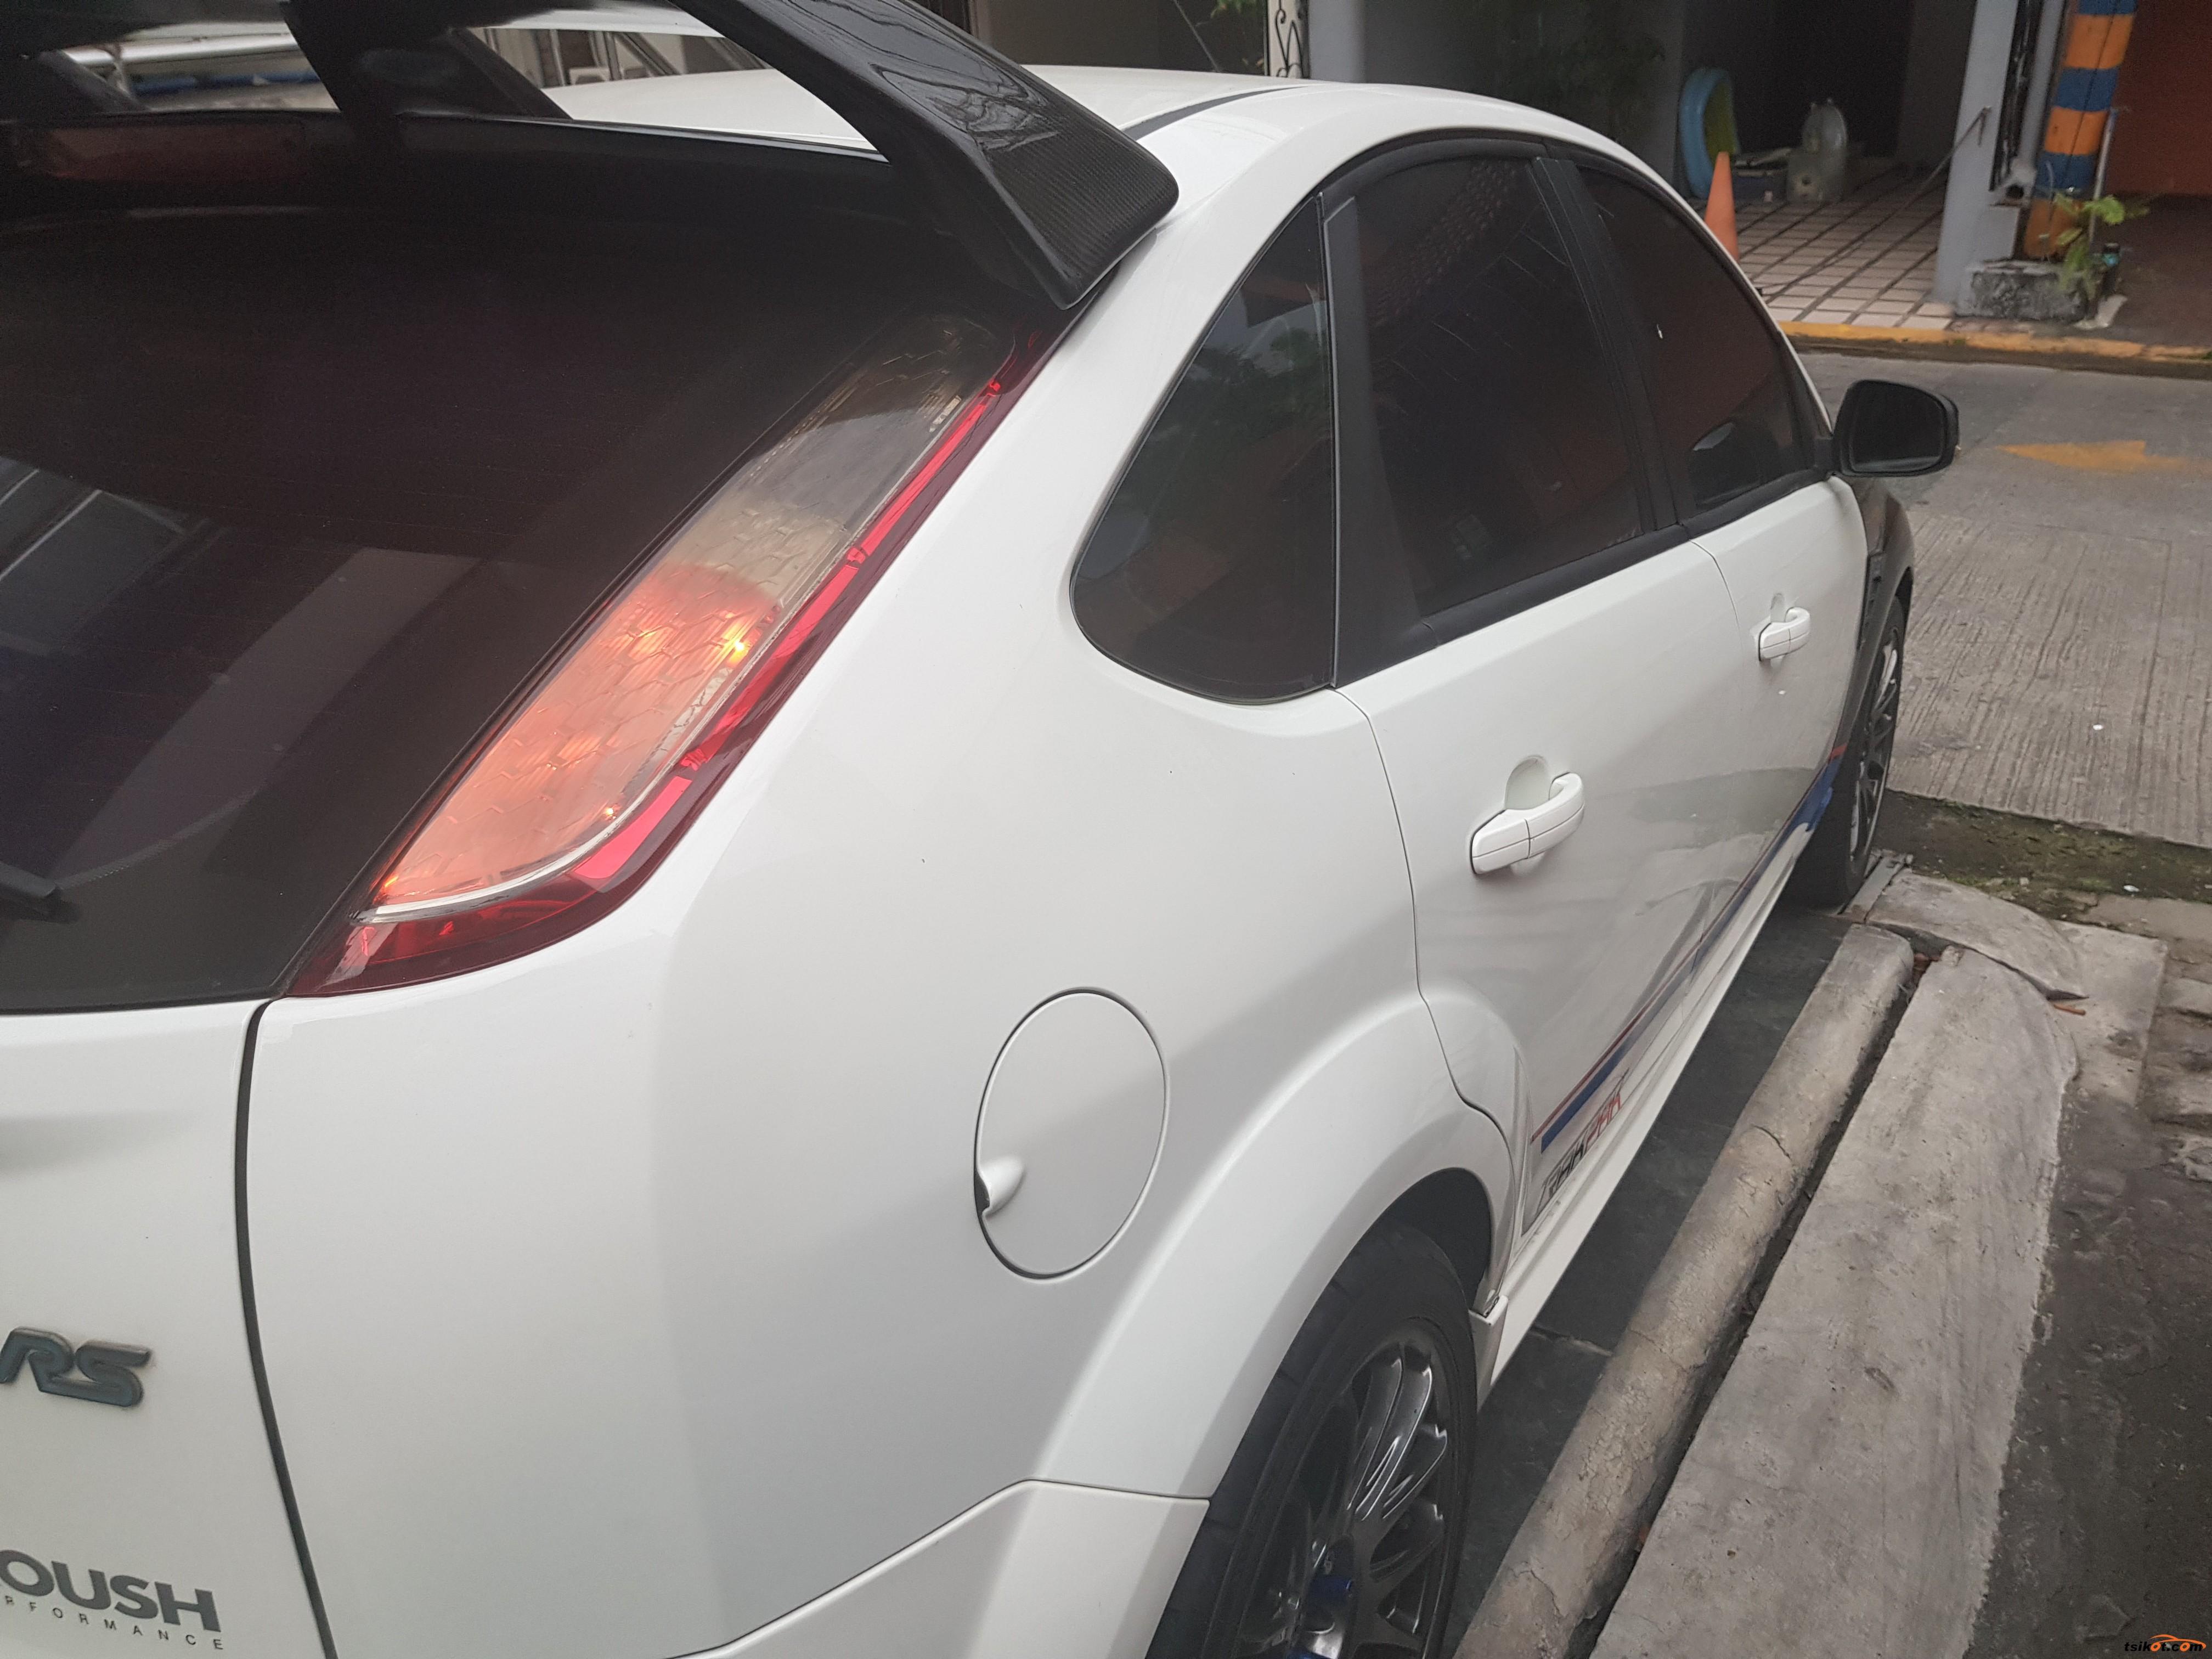 Ford Focus 2010 - 7